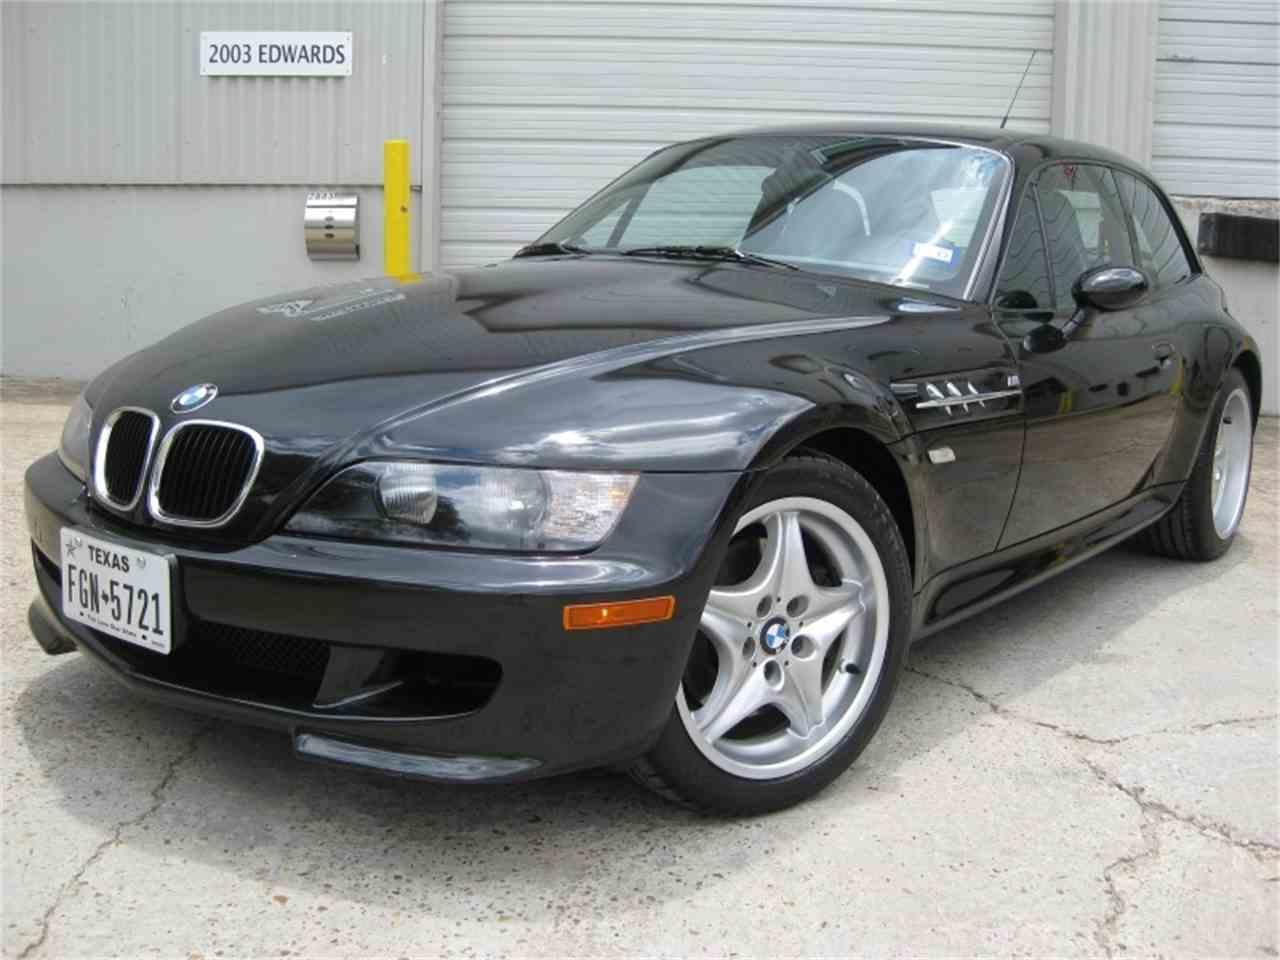 1999 Bmw Z3 M Coupe For Sale Classiccars Com Cc 990556